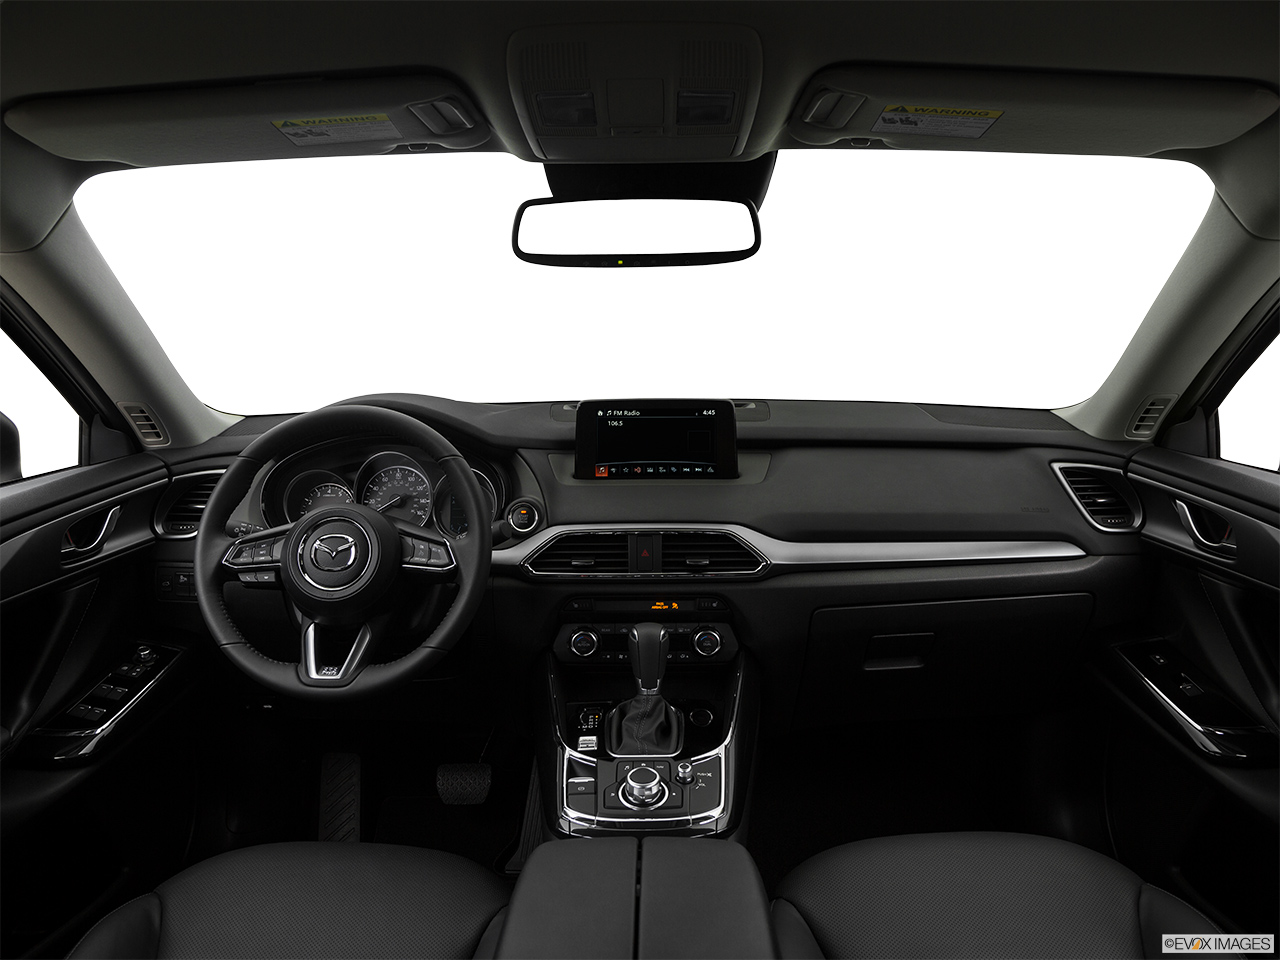 Mazda CX-9 2018, Saudi Arabia, Centered wide dash shot